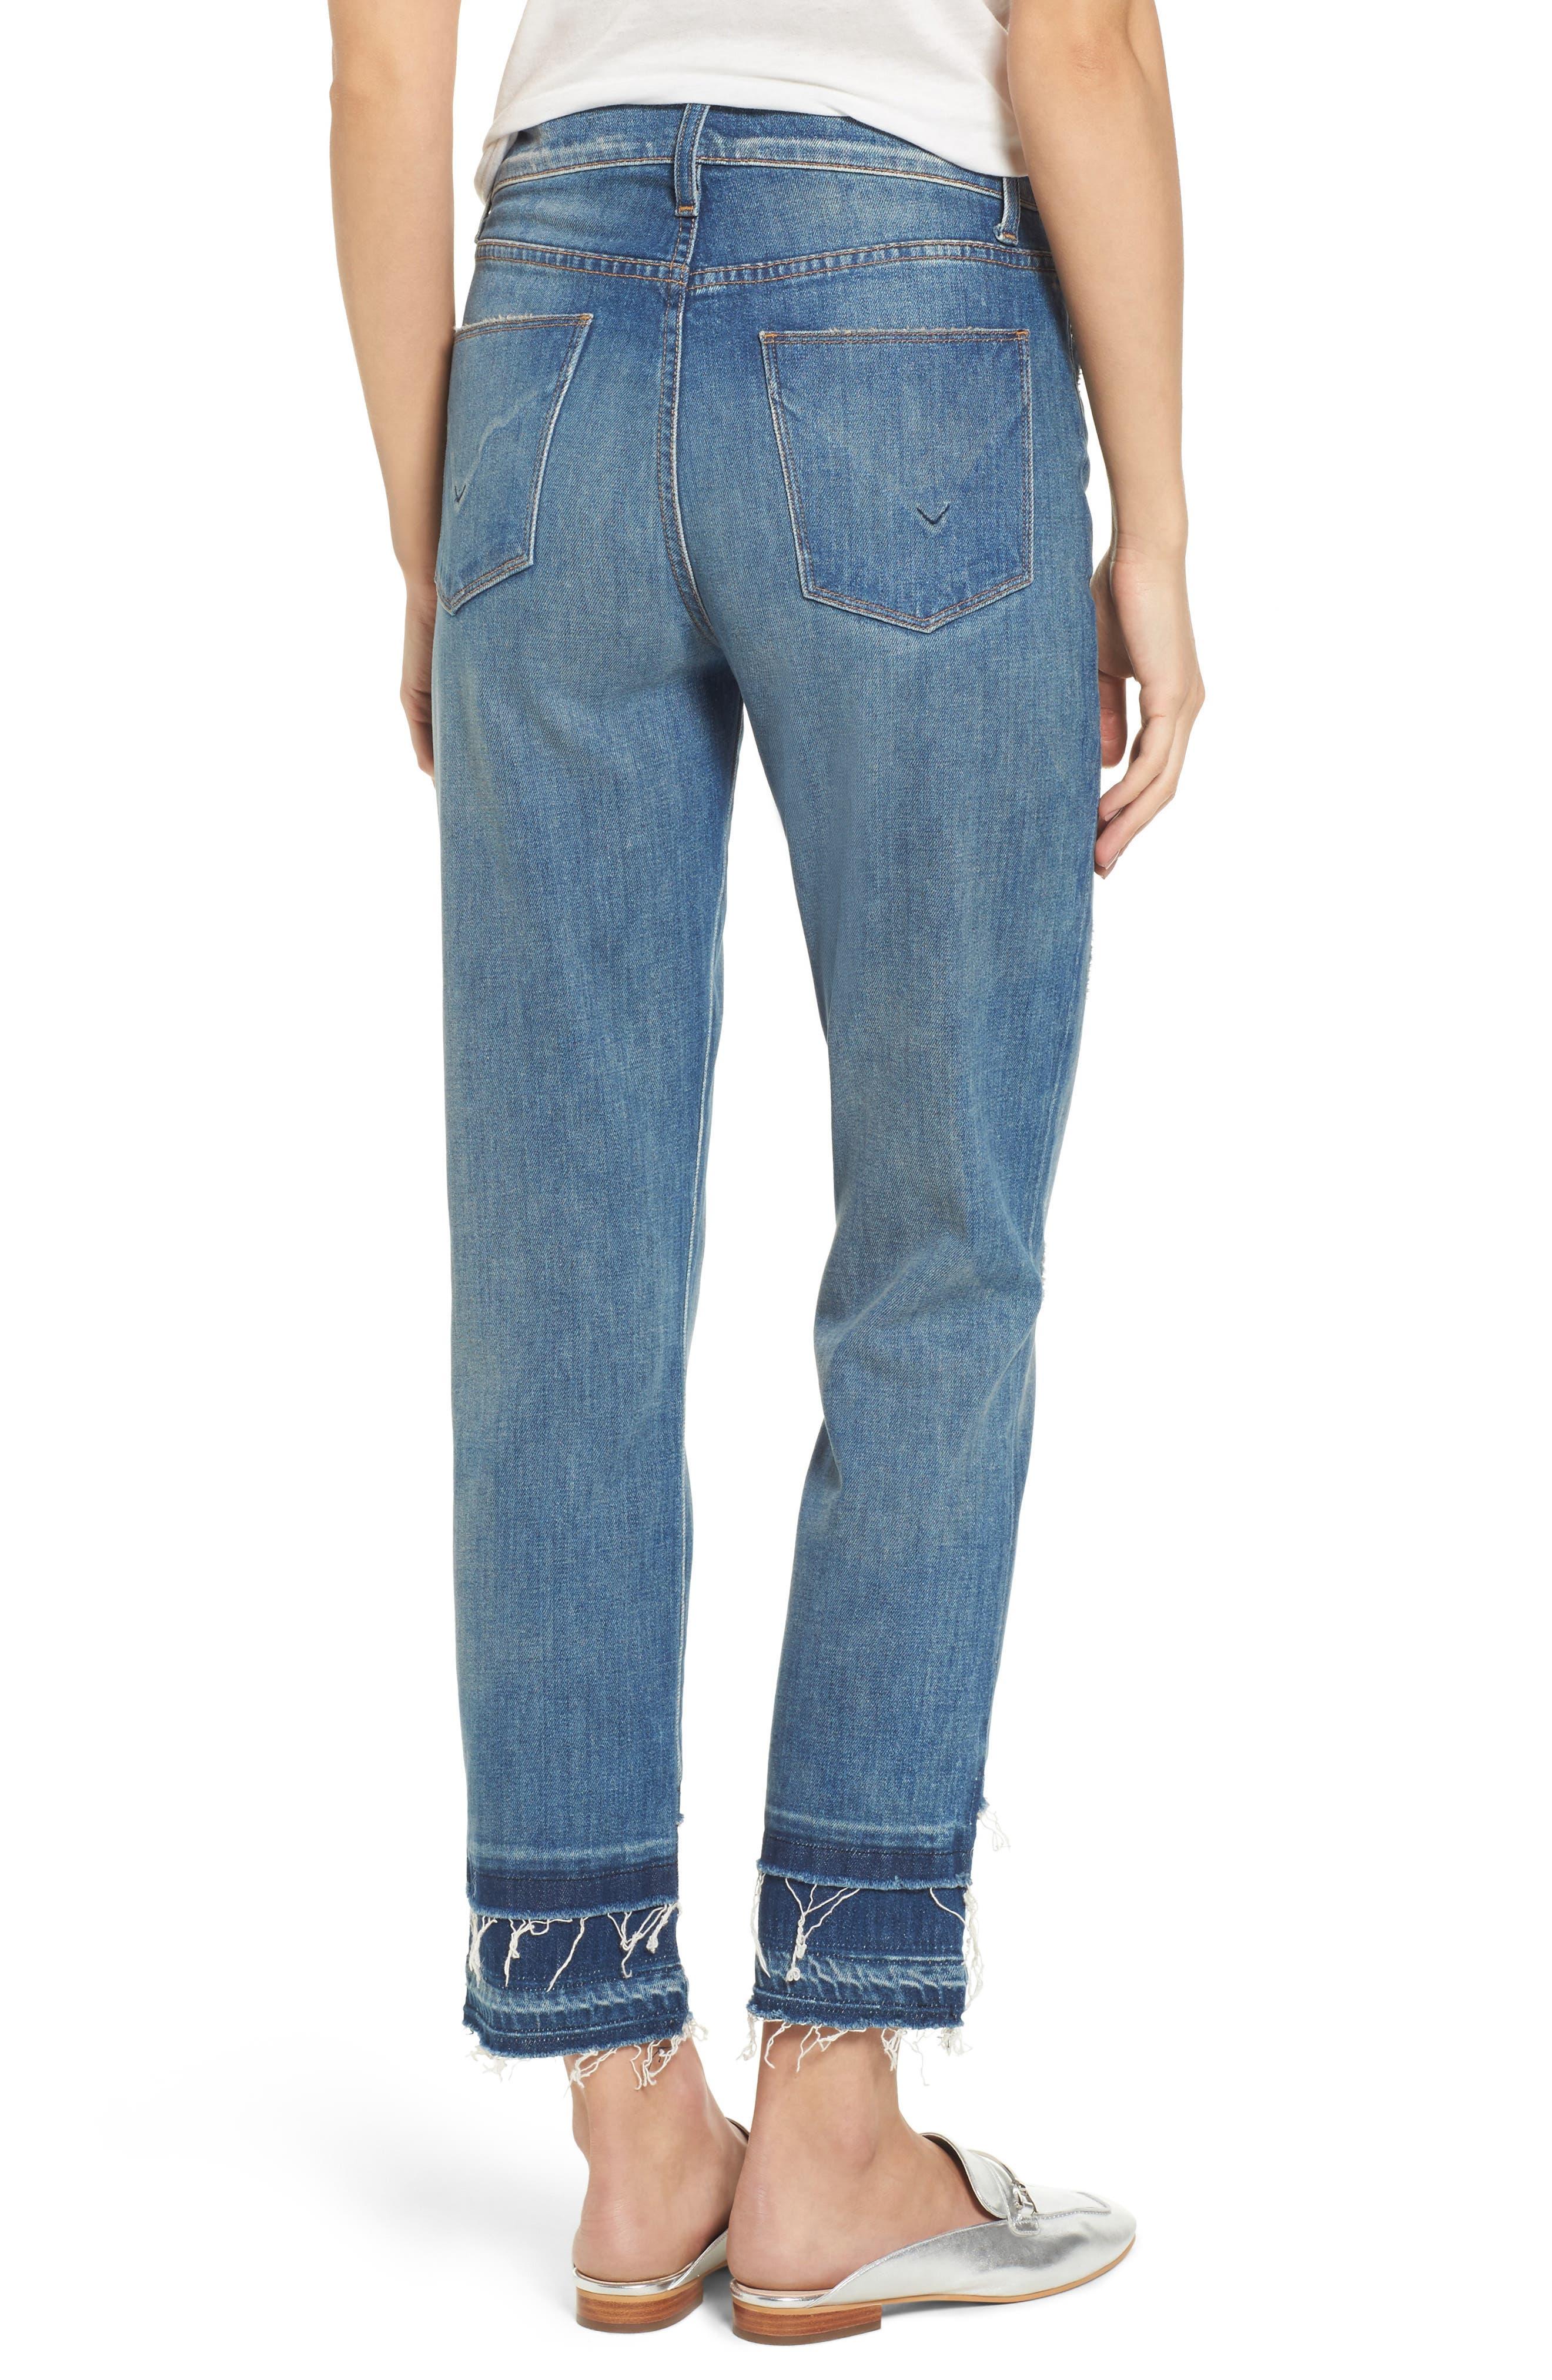 Zoeey High Waist Crop Straight Leg Jeans,                             Alternate thumbnail 2, color,